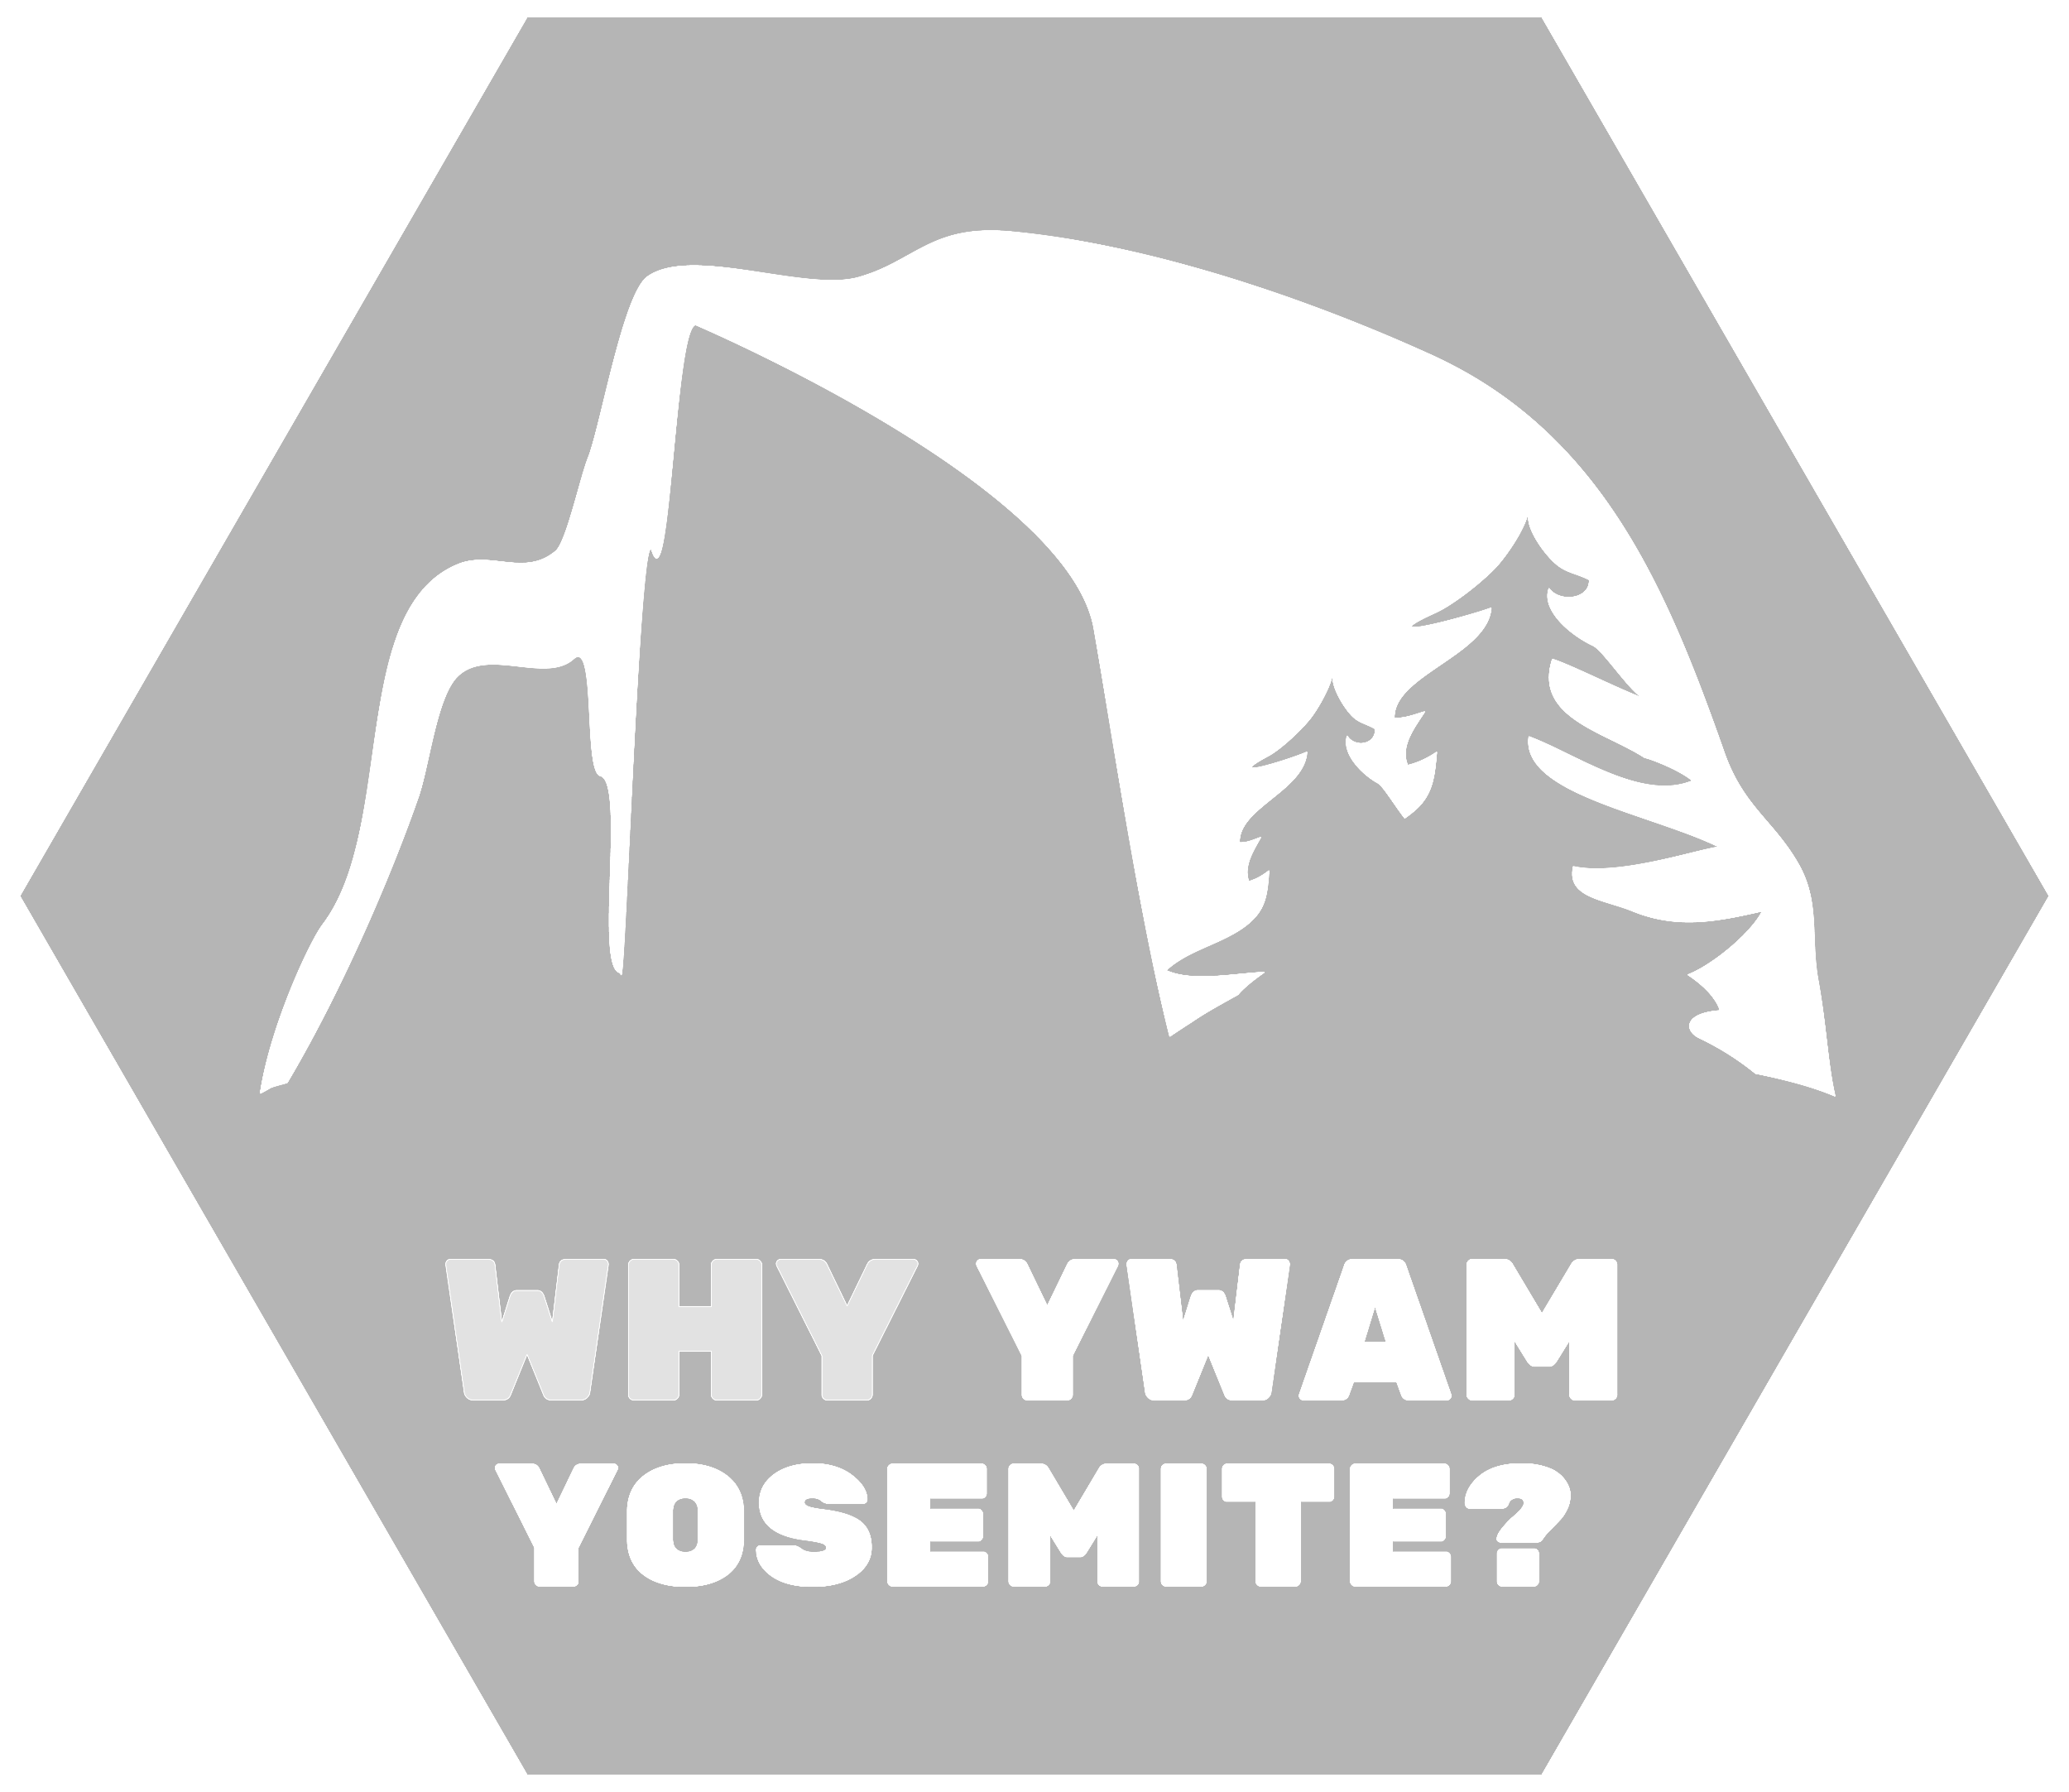 why yosemite2.png